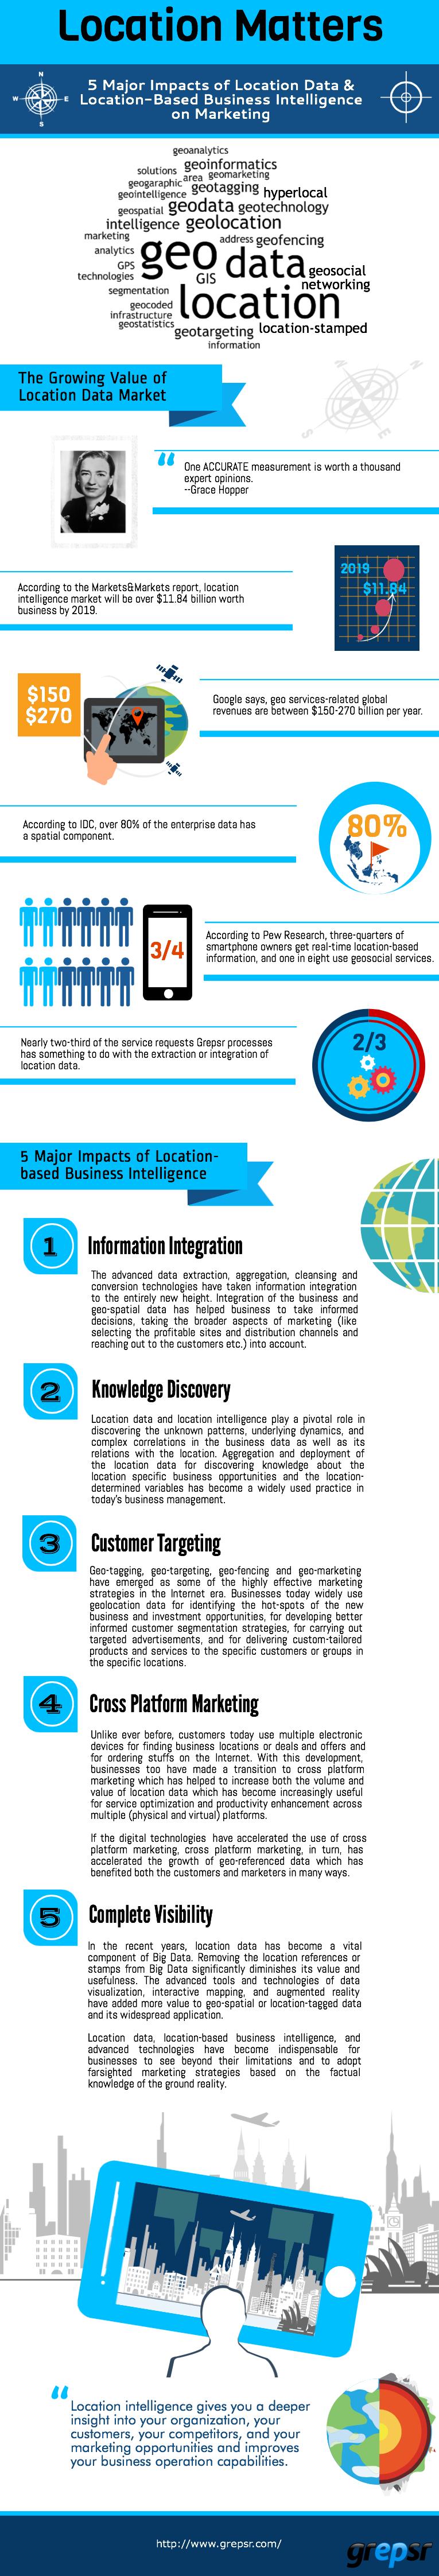 Location-based-Business-Intelligence